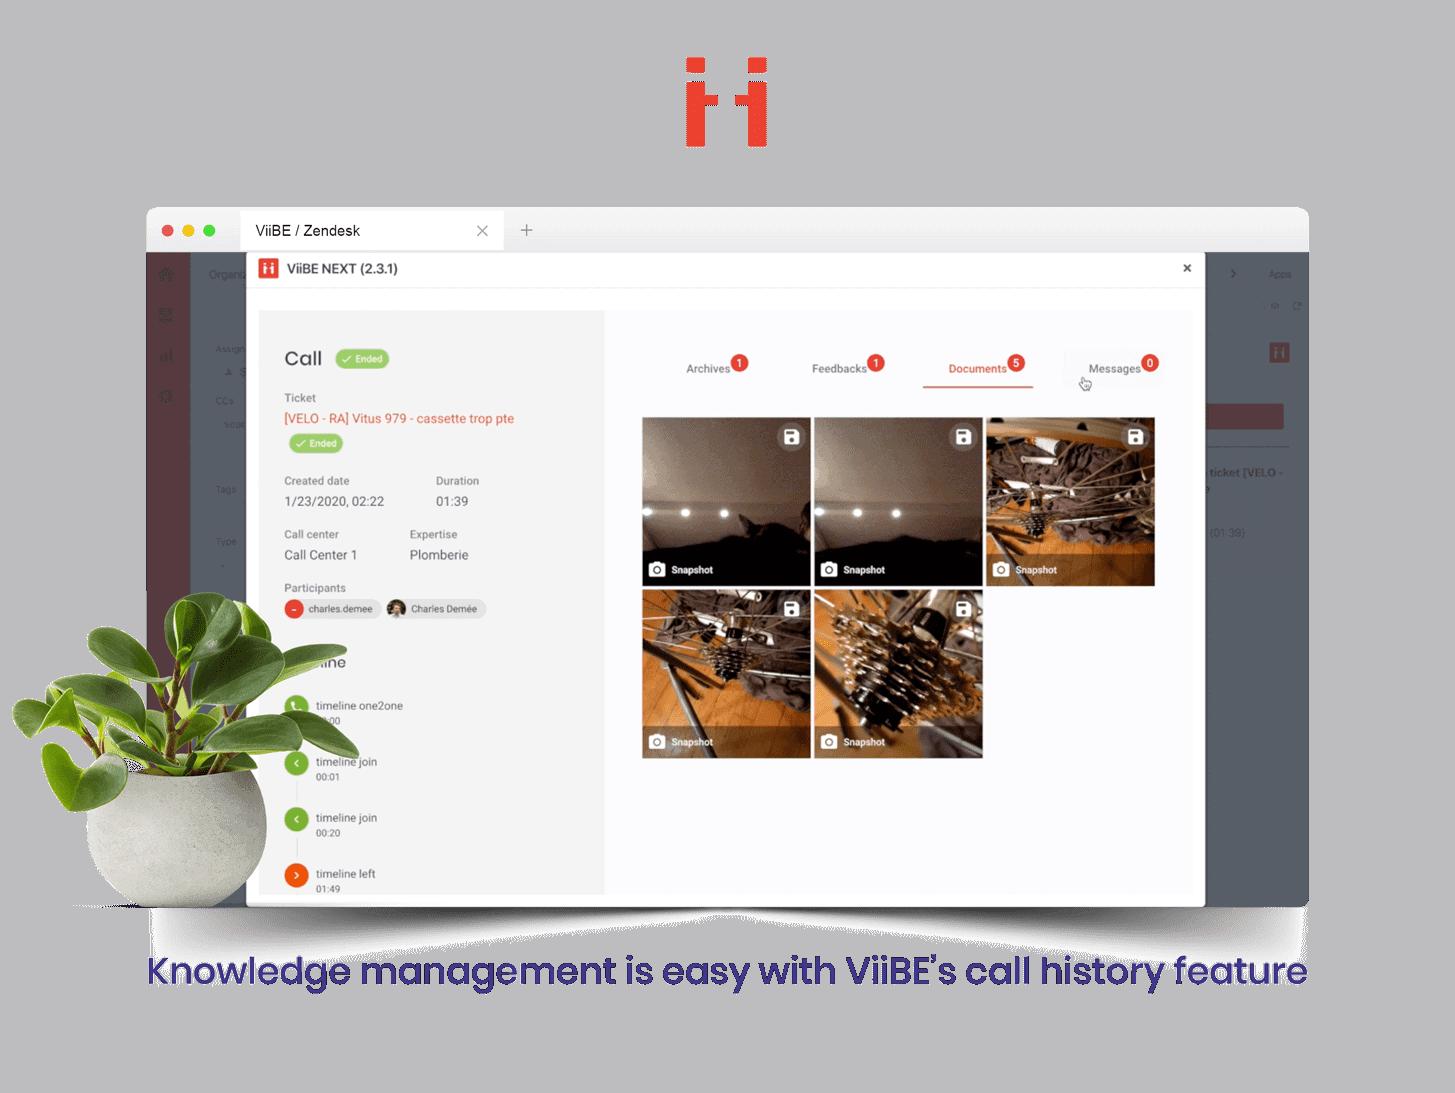 ViiBE ticket interface in Zendesk